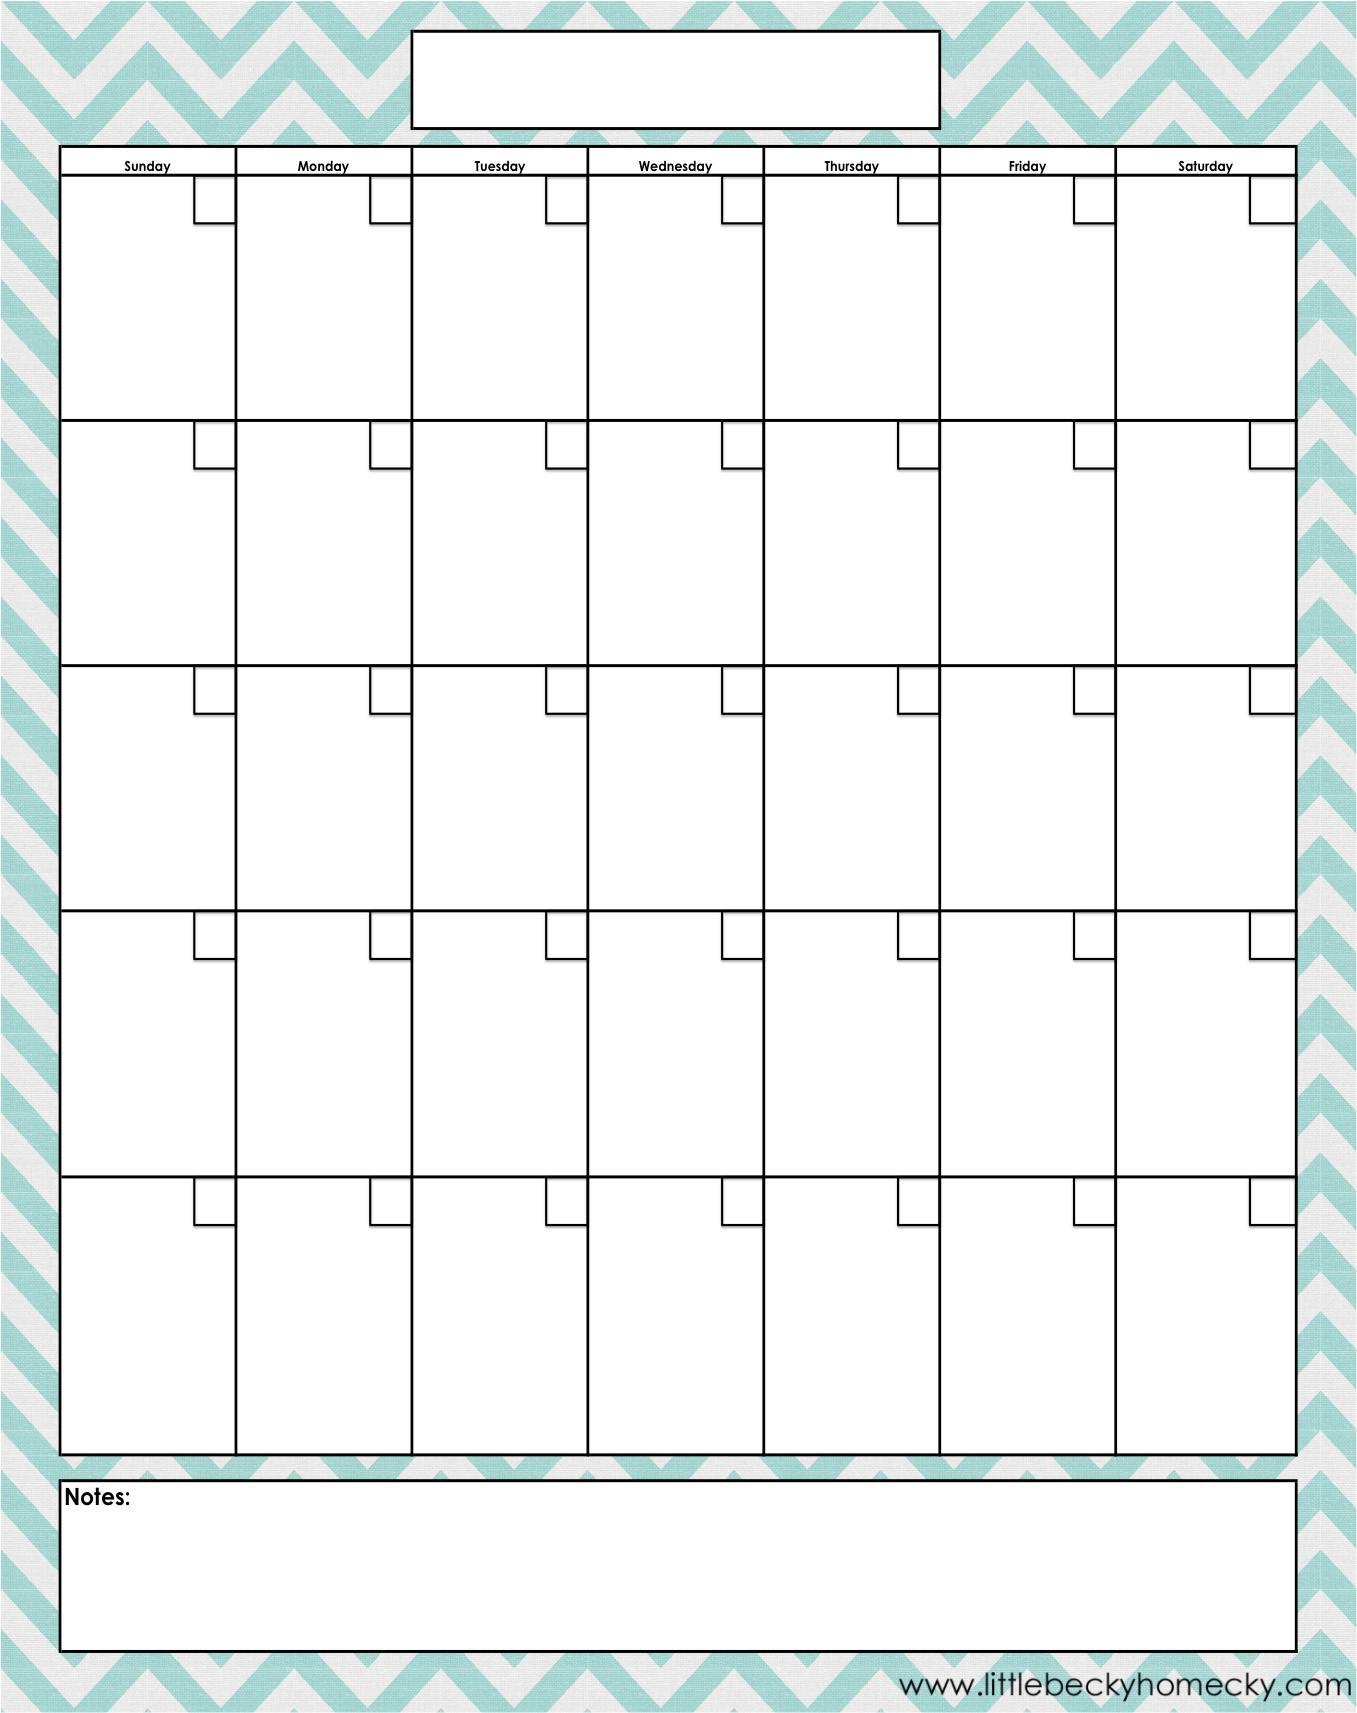 Blank-Monthly-Calendar-Printable-Pdfs throughout Printable Calendar By Month Blank